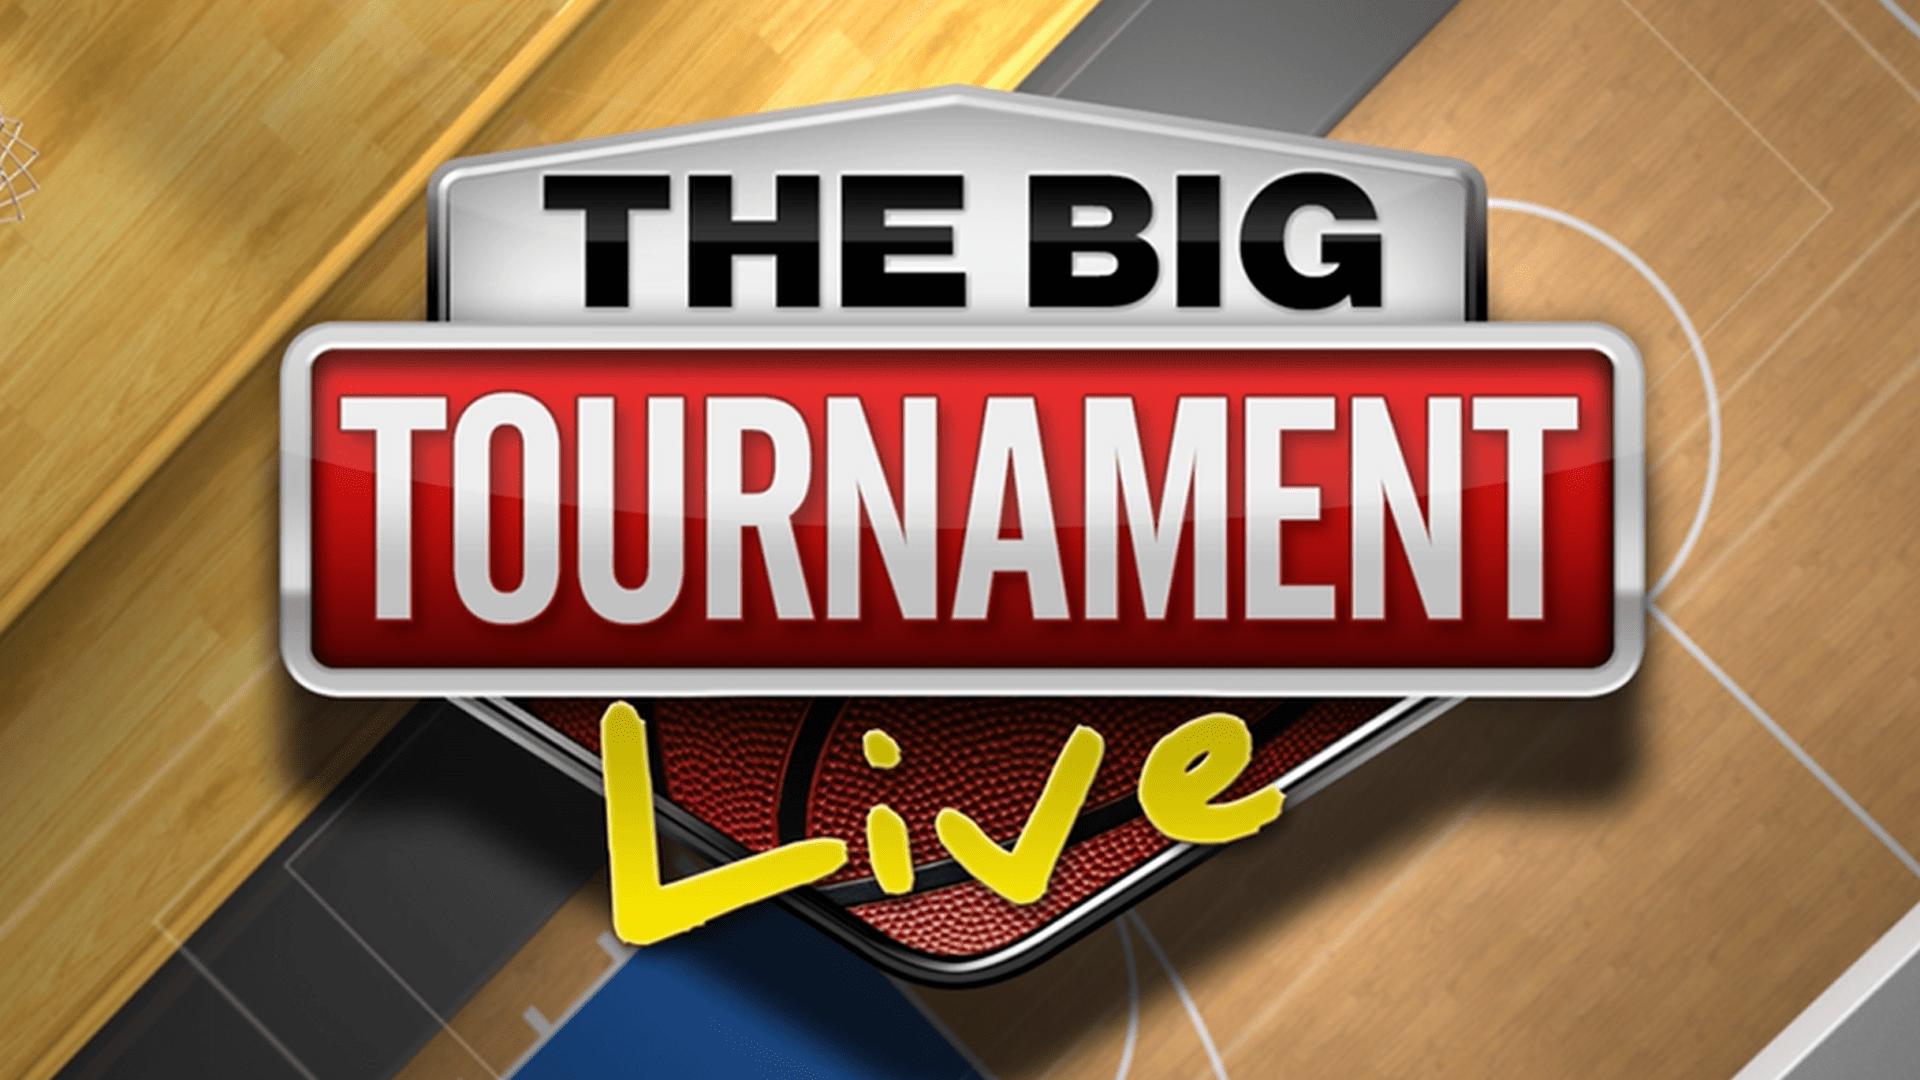 the big tournament live_1553176949636.png-873772846.jpg